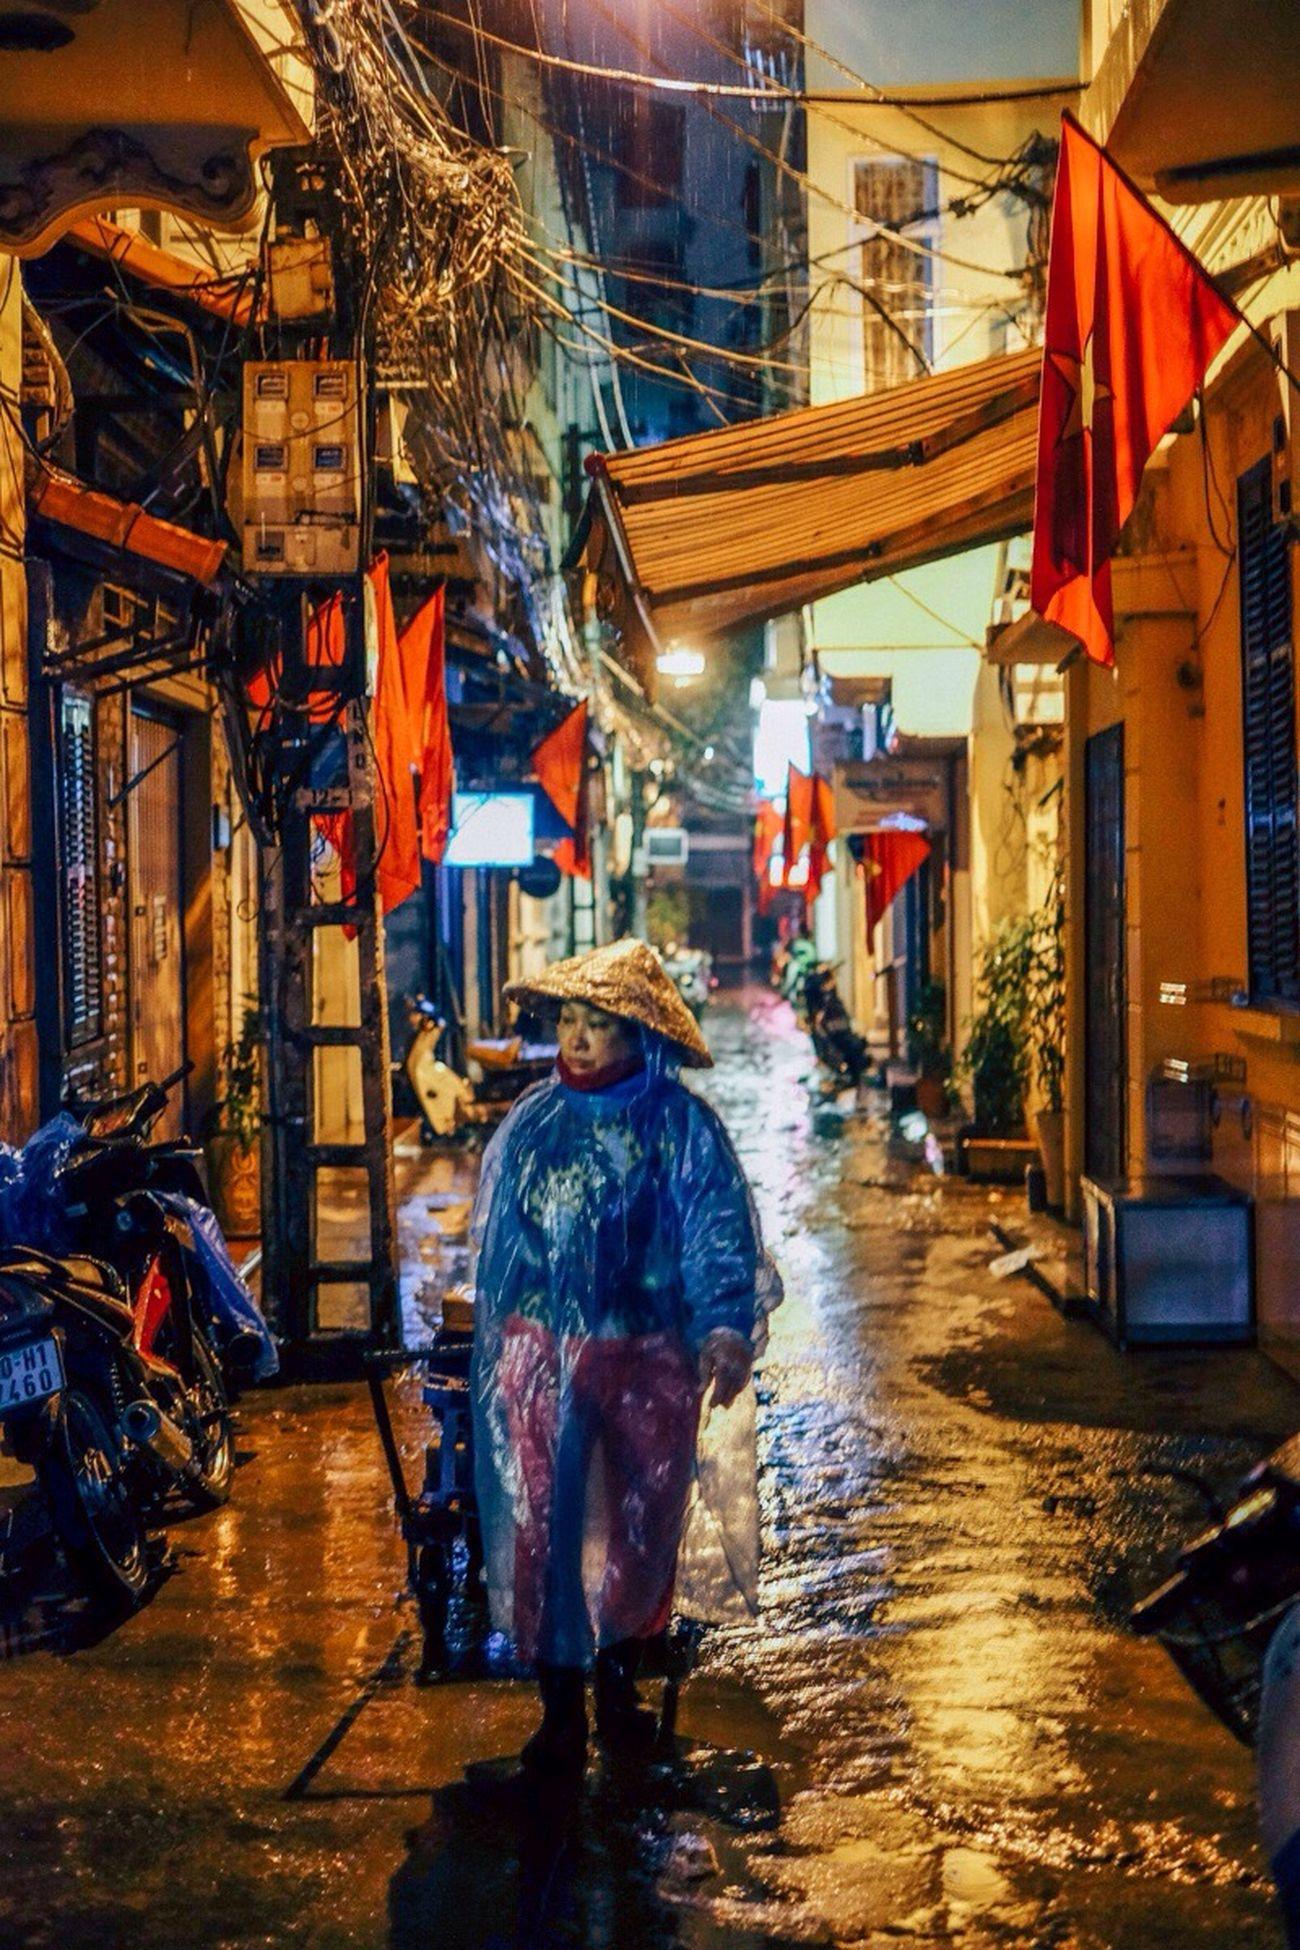 Rainy night in Hanoi's Old Quarter The Street Photographer - 2016 EyeEm Awards Shootermag City Life Traveling Travel Vietnam Rainy Reflection Street 43 Golden Moments Feel The Journey